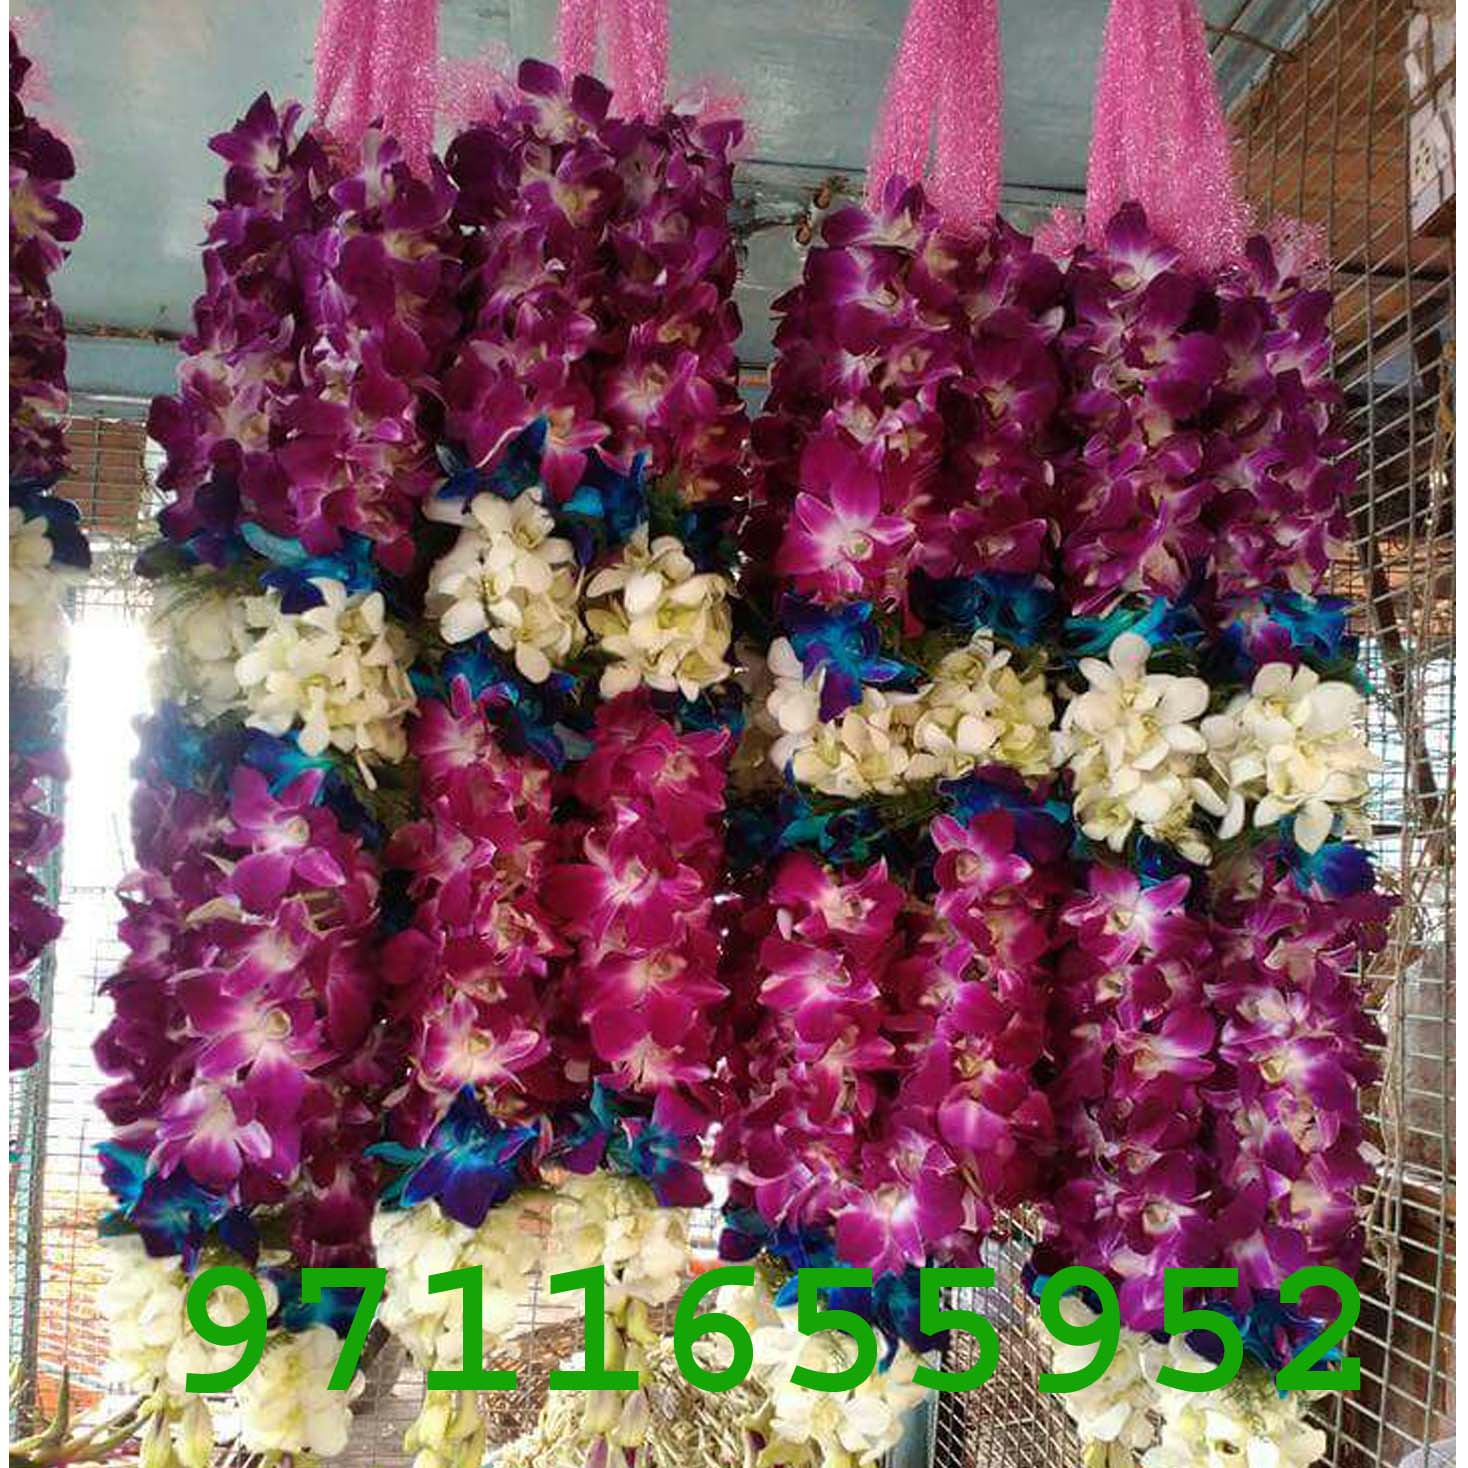 Purple Orchid Jaimala Price Flower N Petals 9711655952